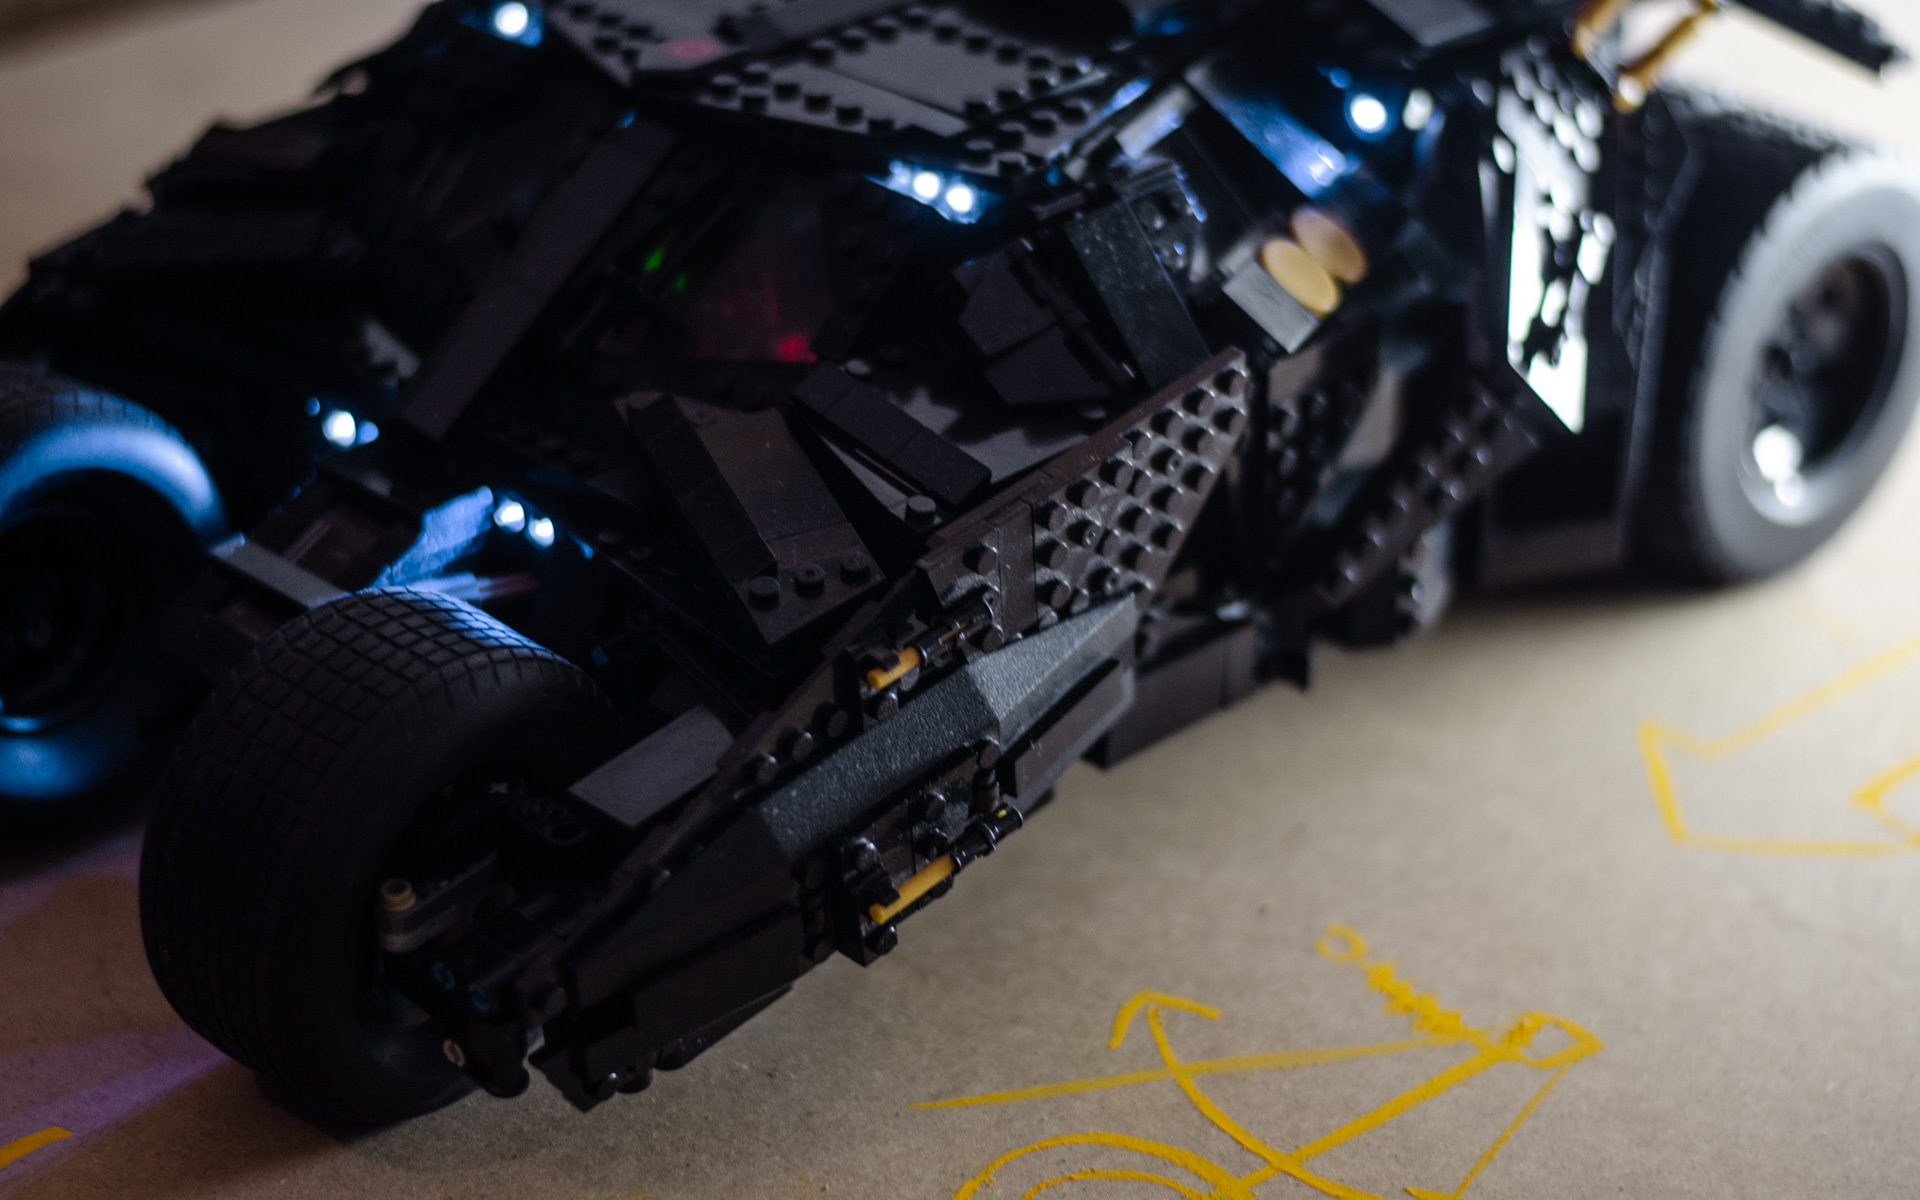 76023_lego_tumbler_motorized_power_functions_DSC_8434_1